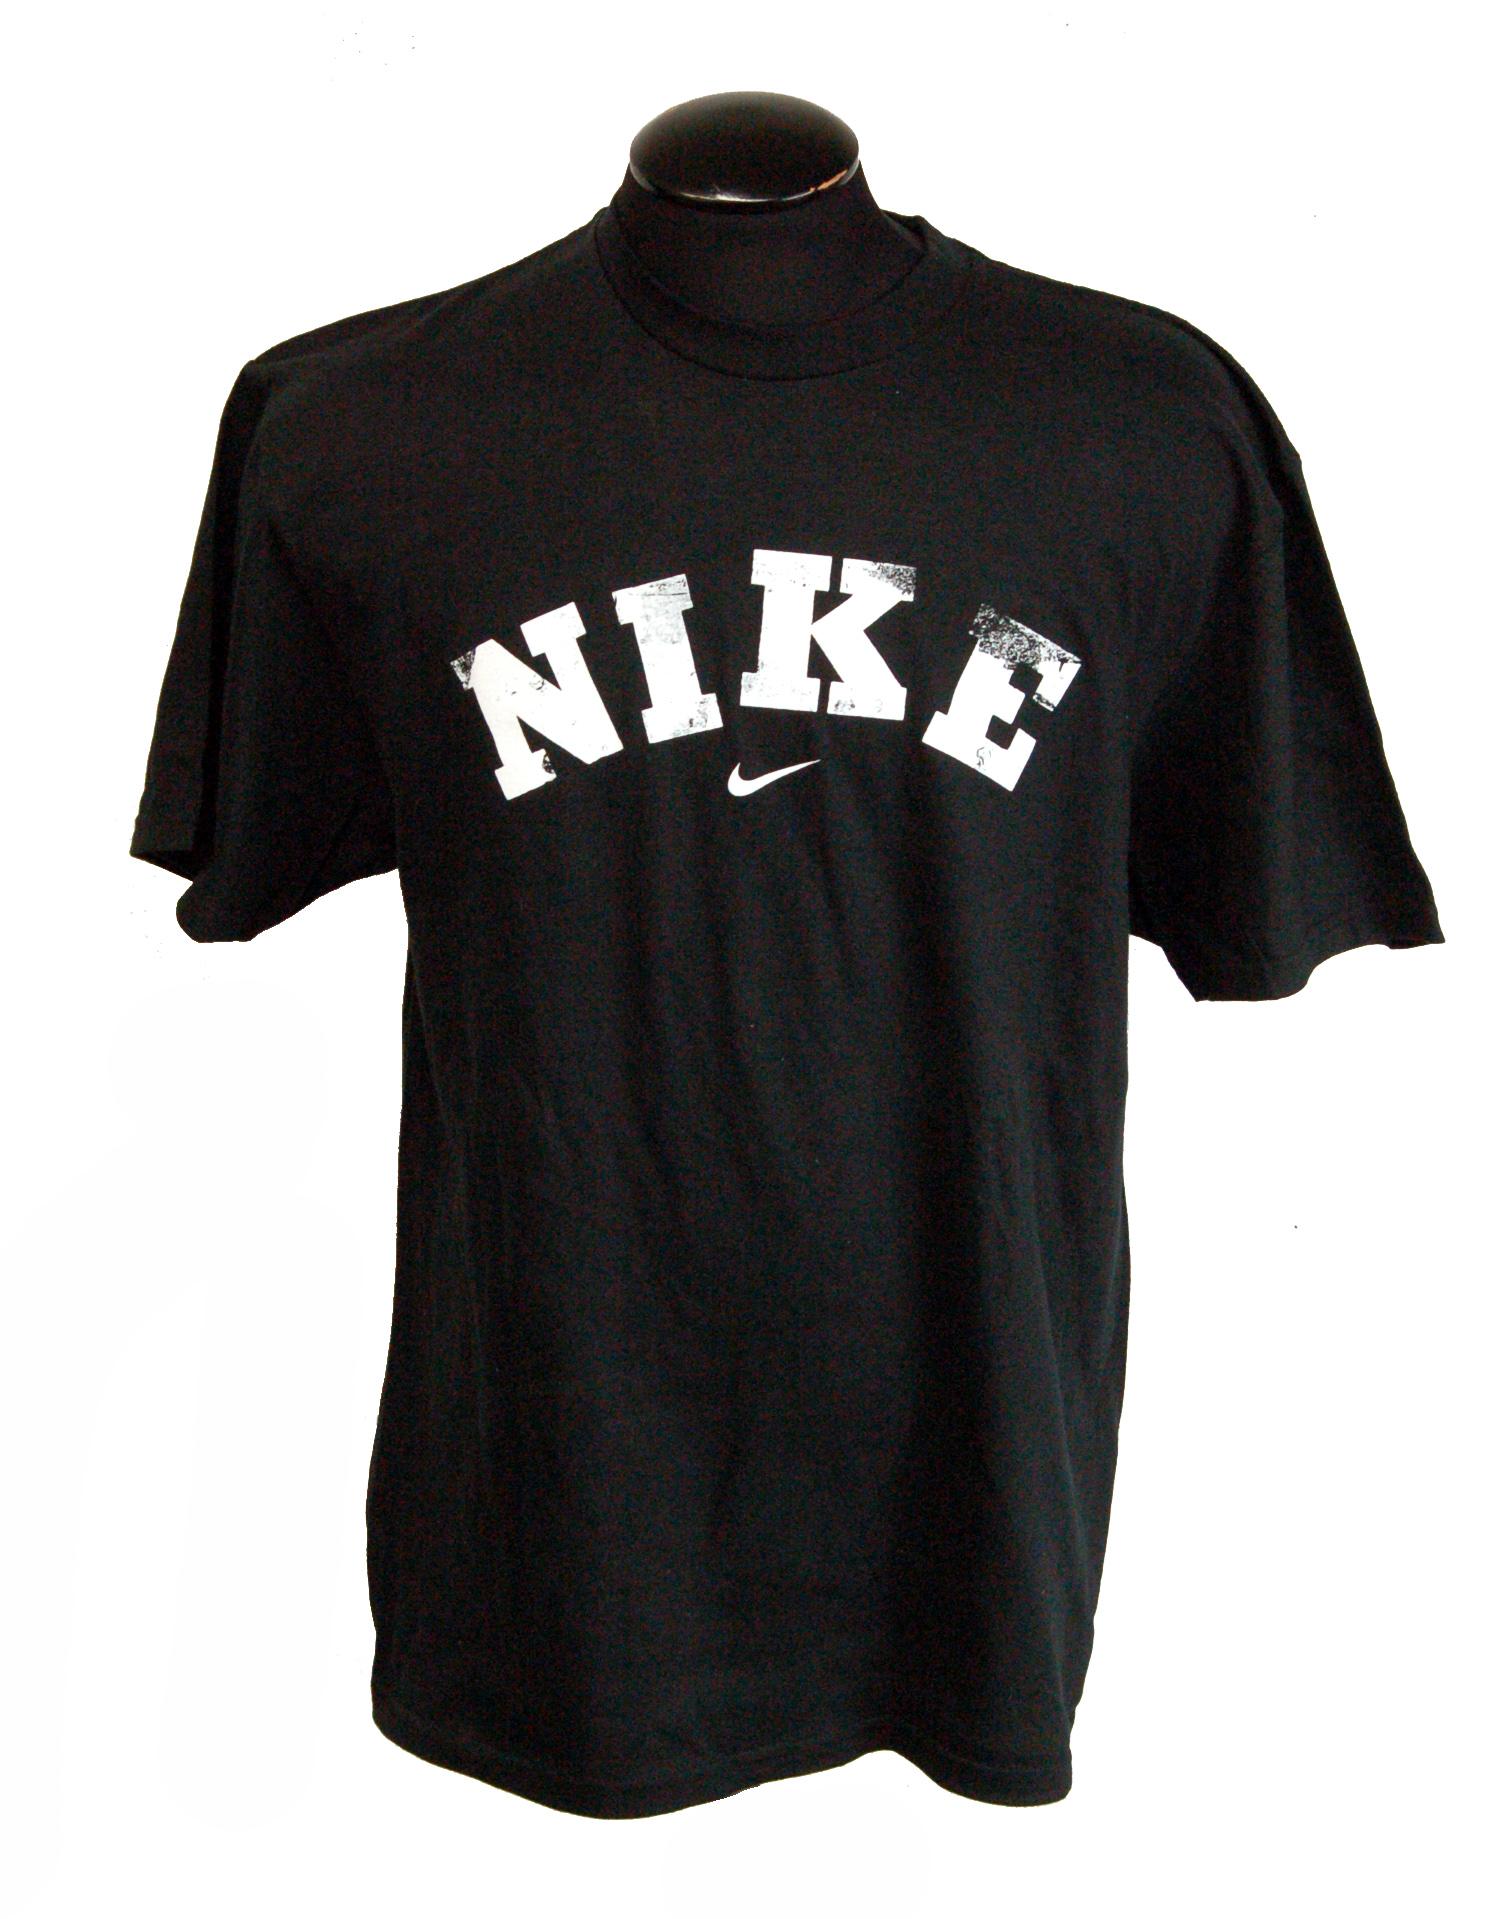 44e9c590f95 Big And Tall Nike T Shirts | RLDM